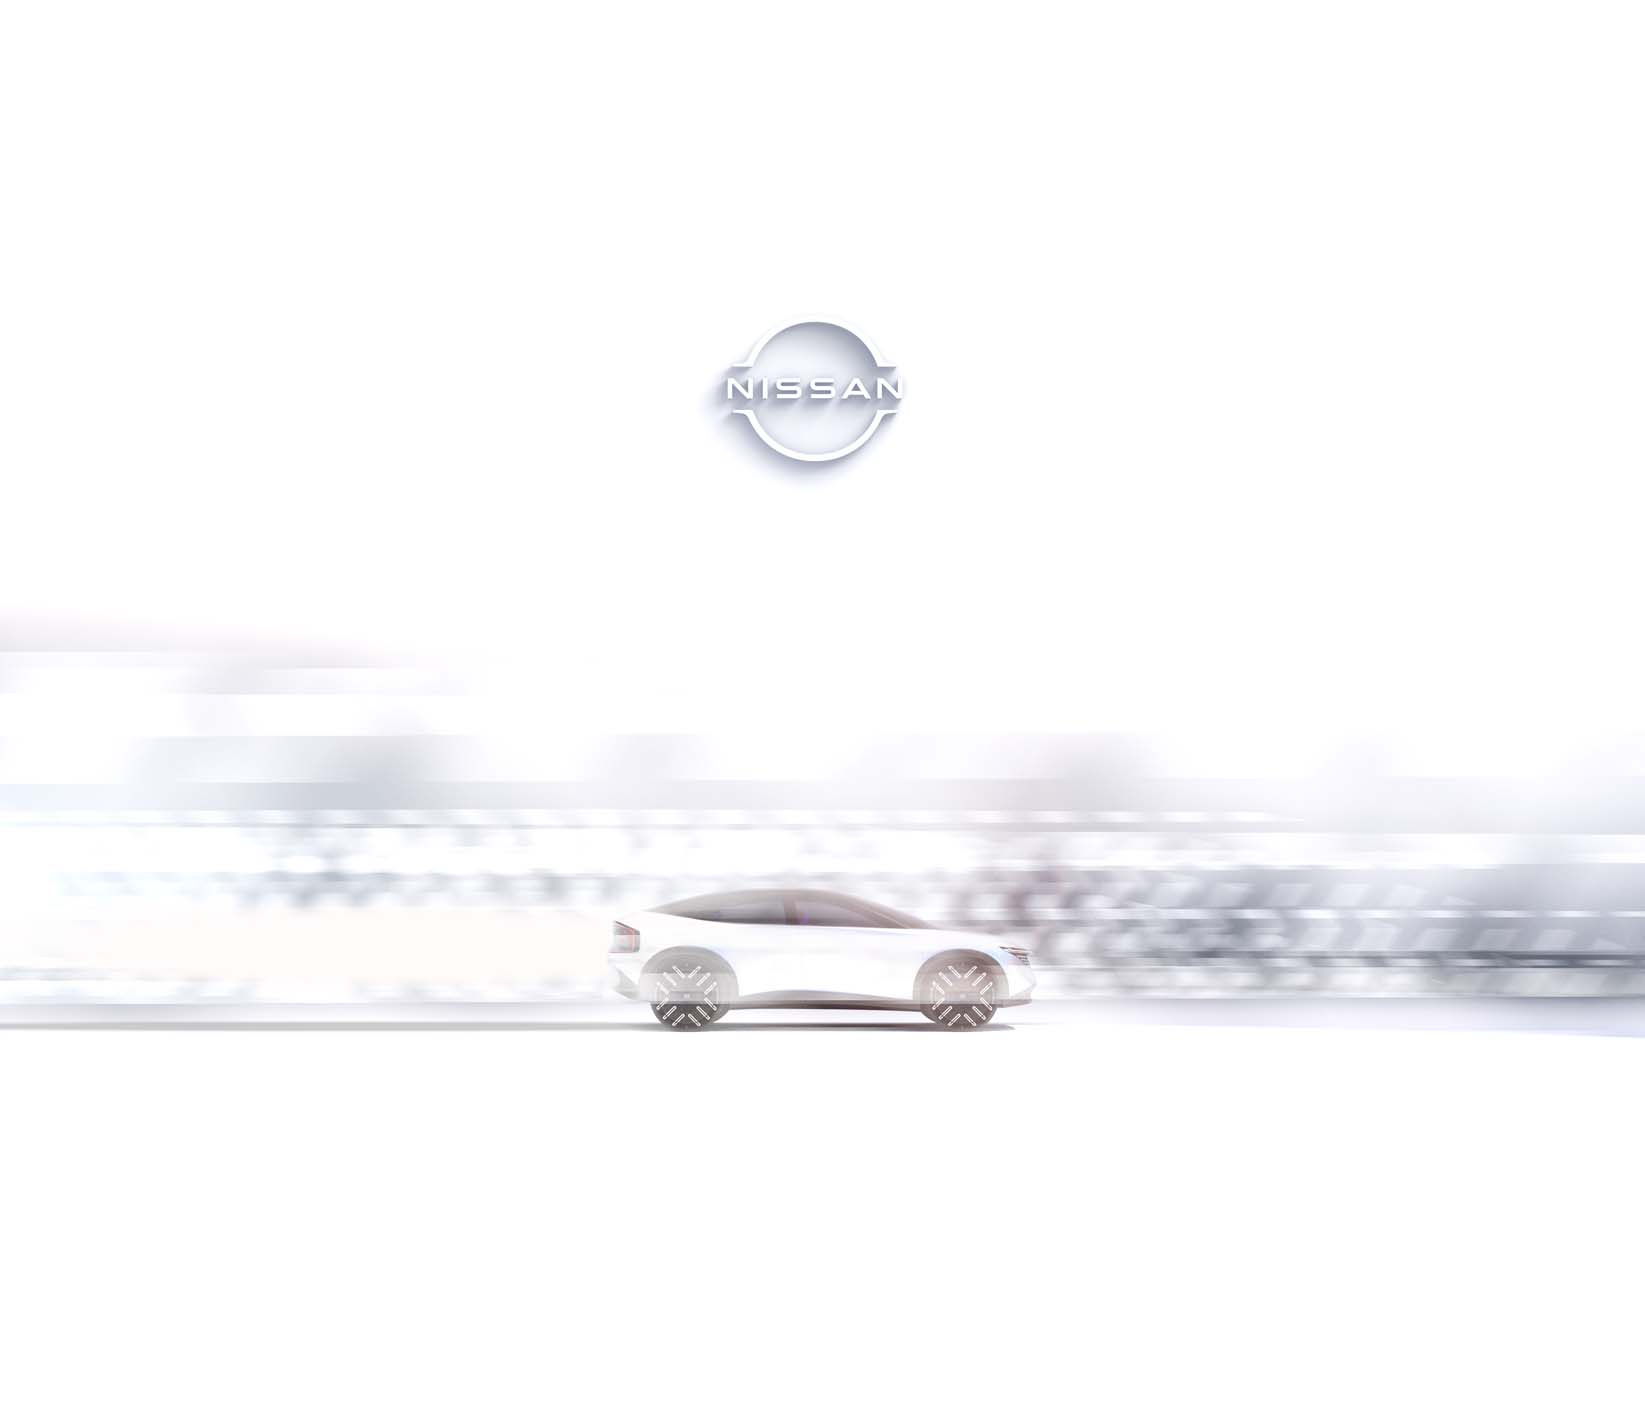 "Teaser image source Το Nissan EV36Zero είναι ένα προσχέδιο για το ""πράσινο"" μέλλον της αυτοκινητοβιομηχανίας Electric cars, electric vehicles, Nissan, Nissan EV36Zero, ειδήσεις, ηλεκτρικά, ηλεκτροκινηση, Νέα"